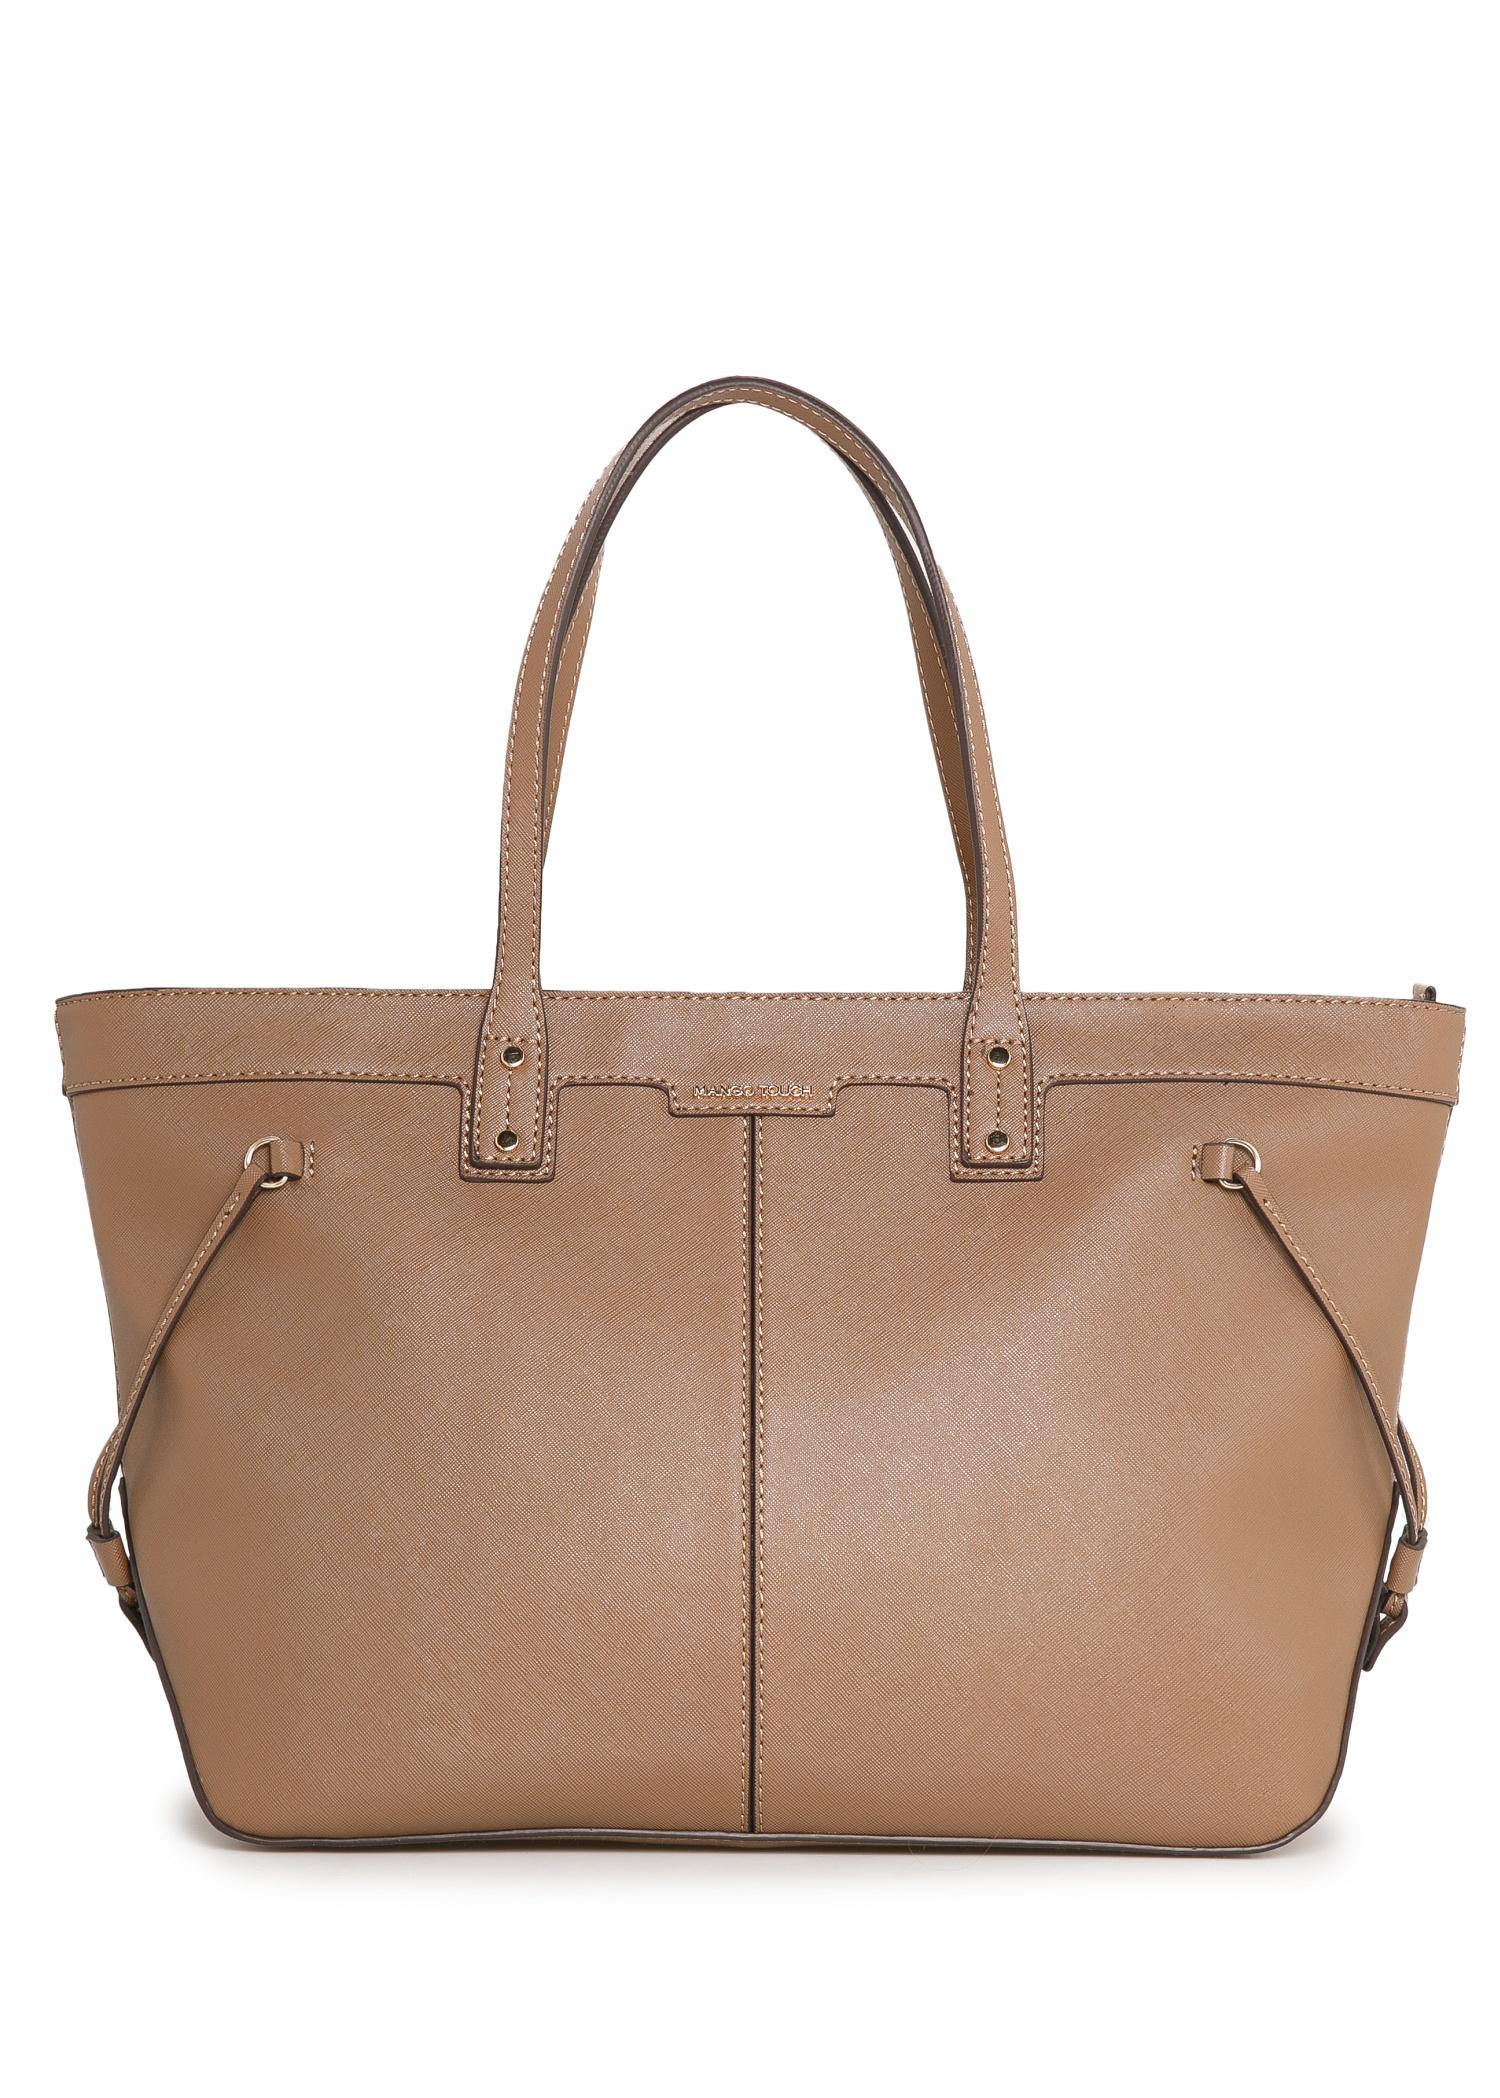 Amazing Mango Cosmetic Bag Shopper Bag In Brown  Lyst